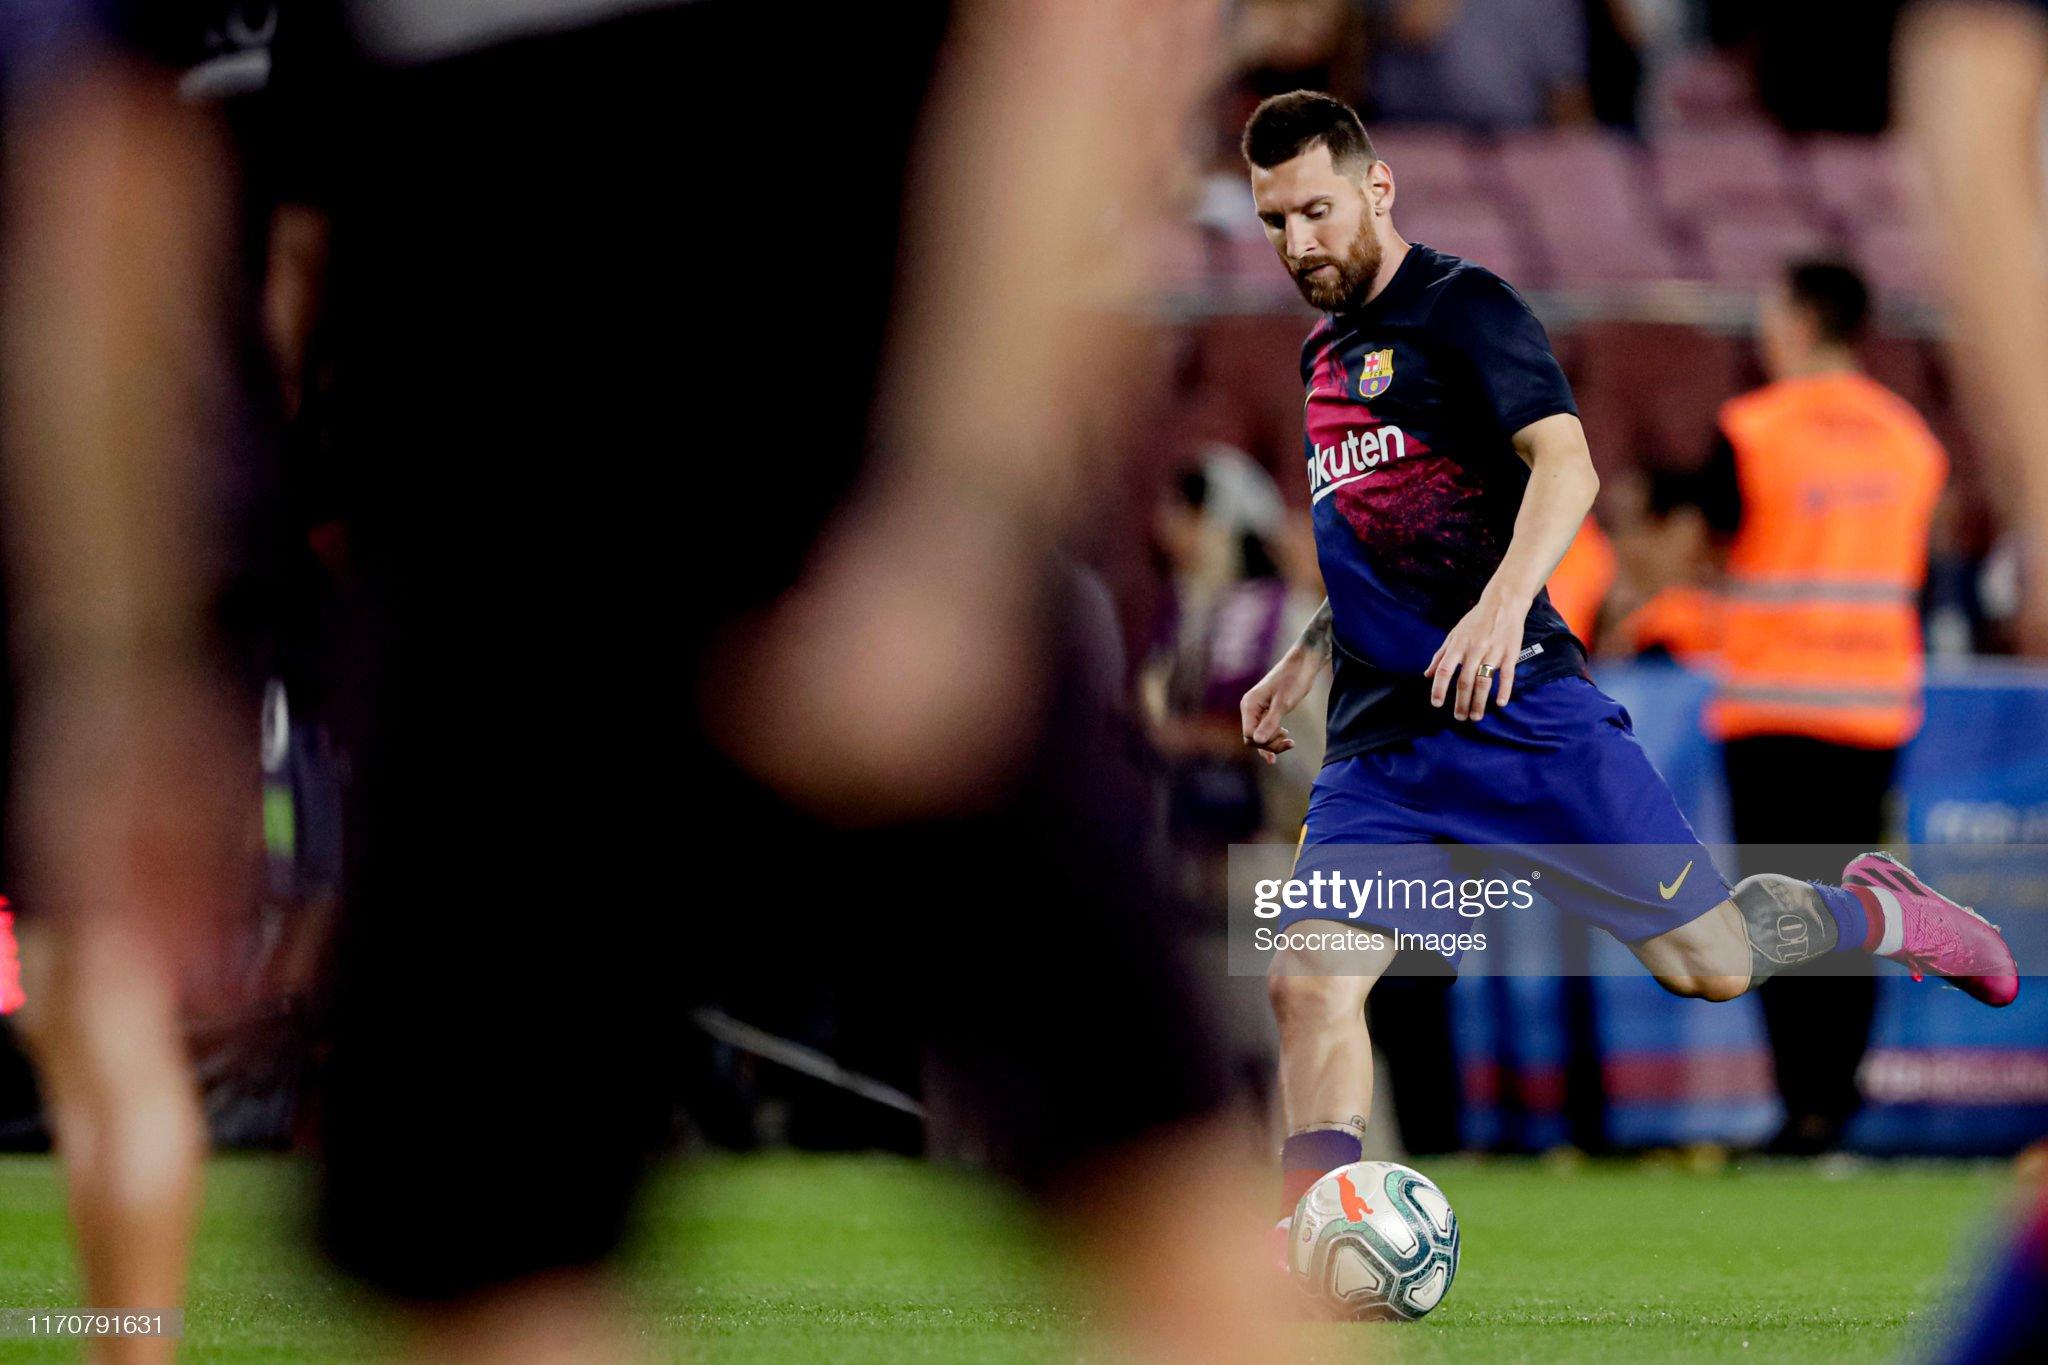 صور مباراة : برشلونة - فياريال 2-1 ( 24-09-2019 )  Lionel-messi-of-fc-barcelona-during-the-la-liga-santander-match-fc-picture-id1170791631?s=2048x2048